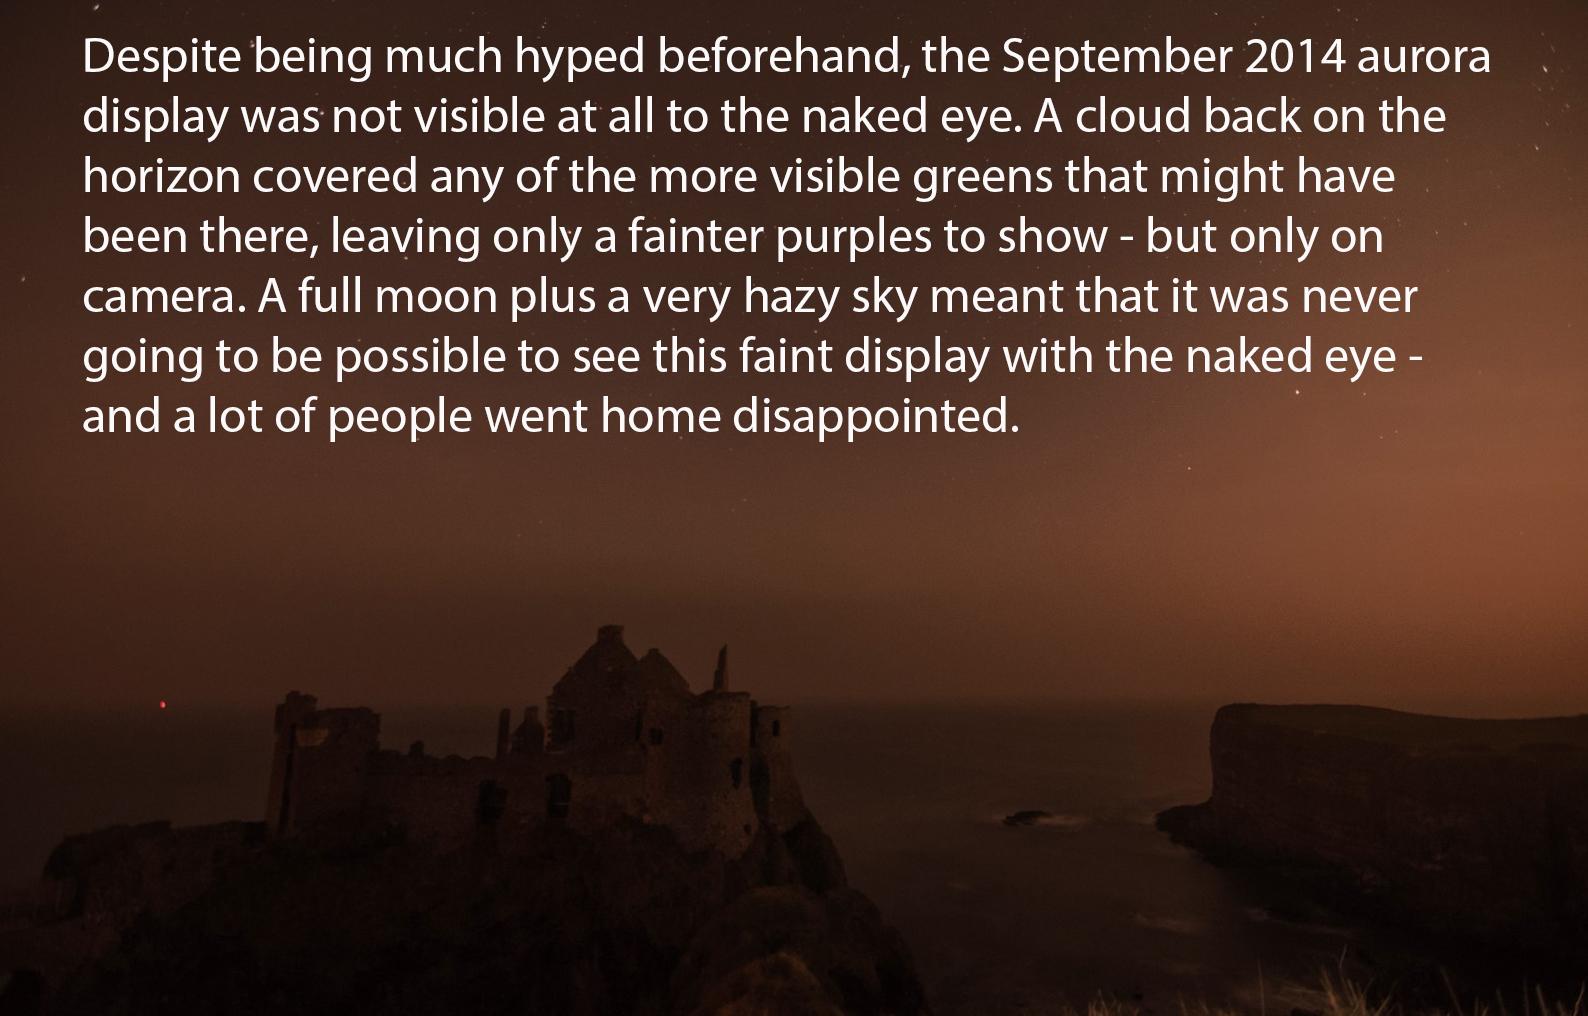 Dunluce aurora (Large) naked eye.jpg